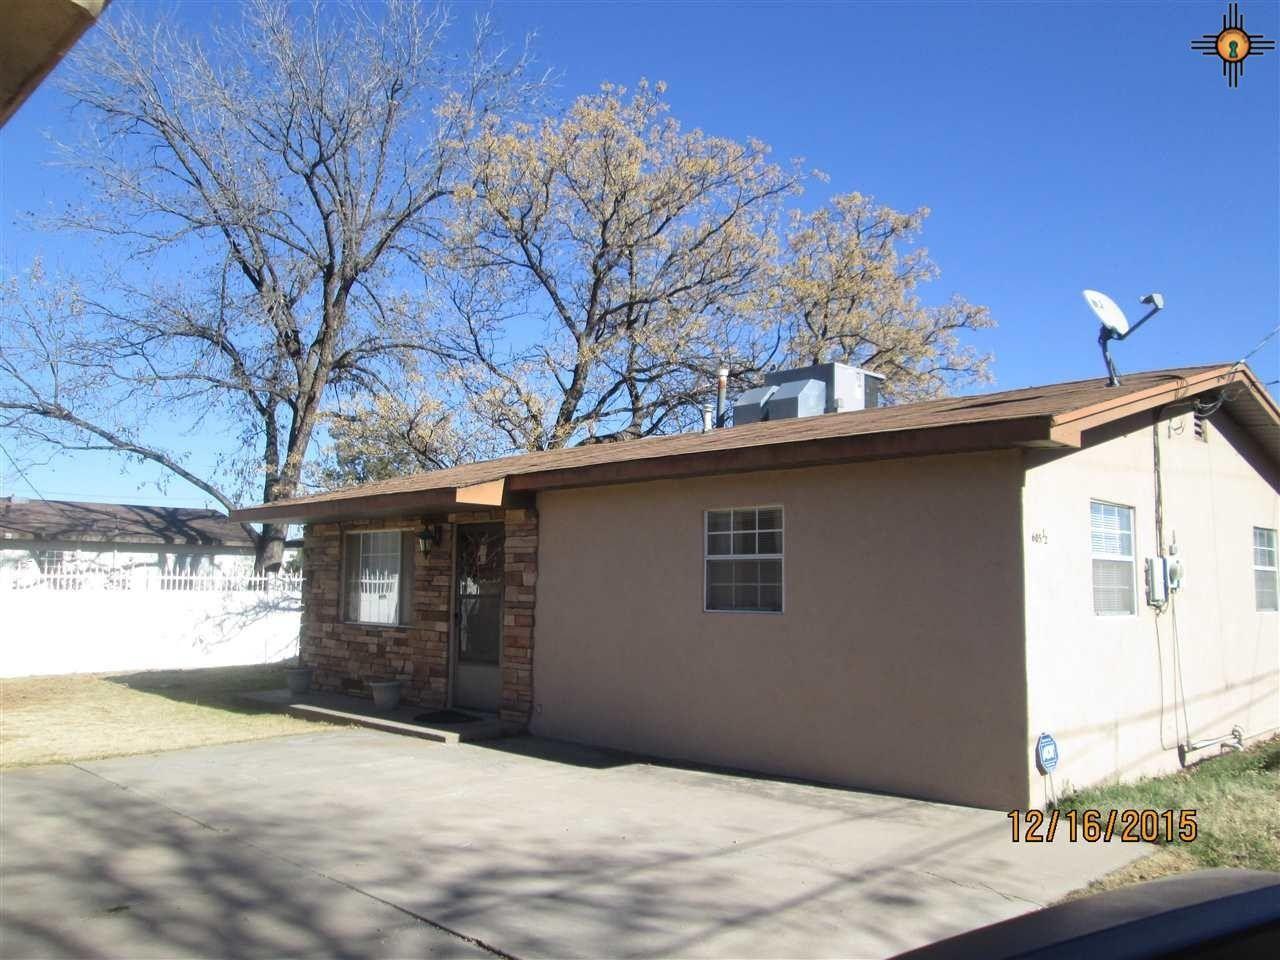 605 1/2 W Quay Ave, Artesia, NM 88210 2 Bedroom House for ...